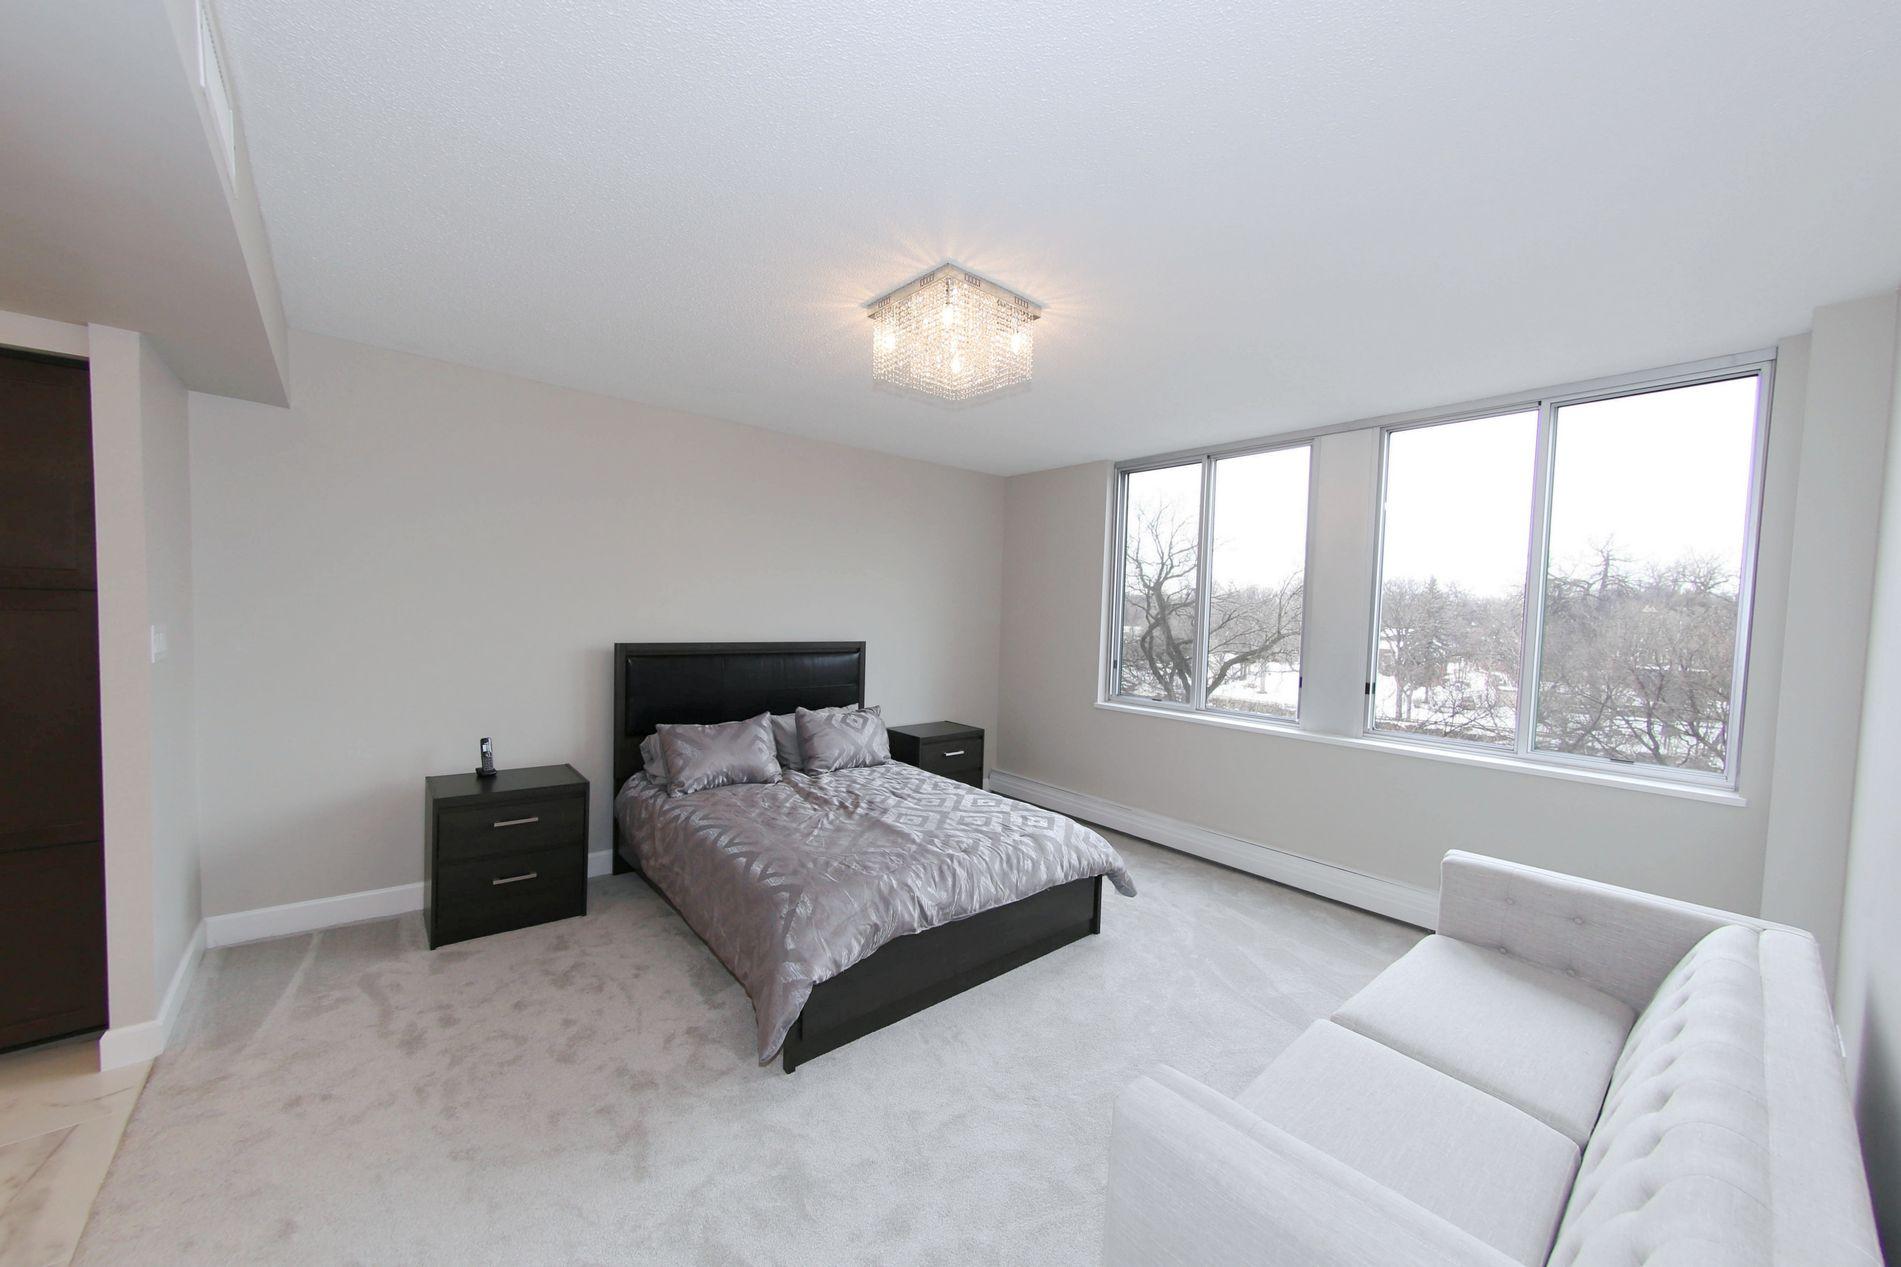 304-323 Wellington Crescent, Winnipeg, Manitoba  R3M 0A4 - Photo 11 - 1703997